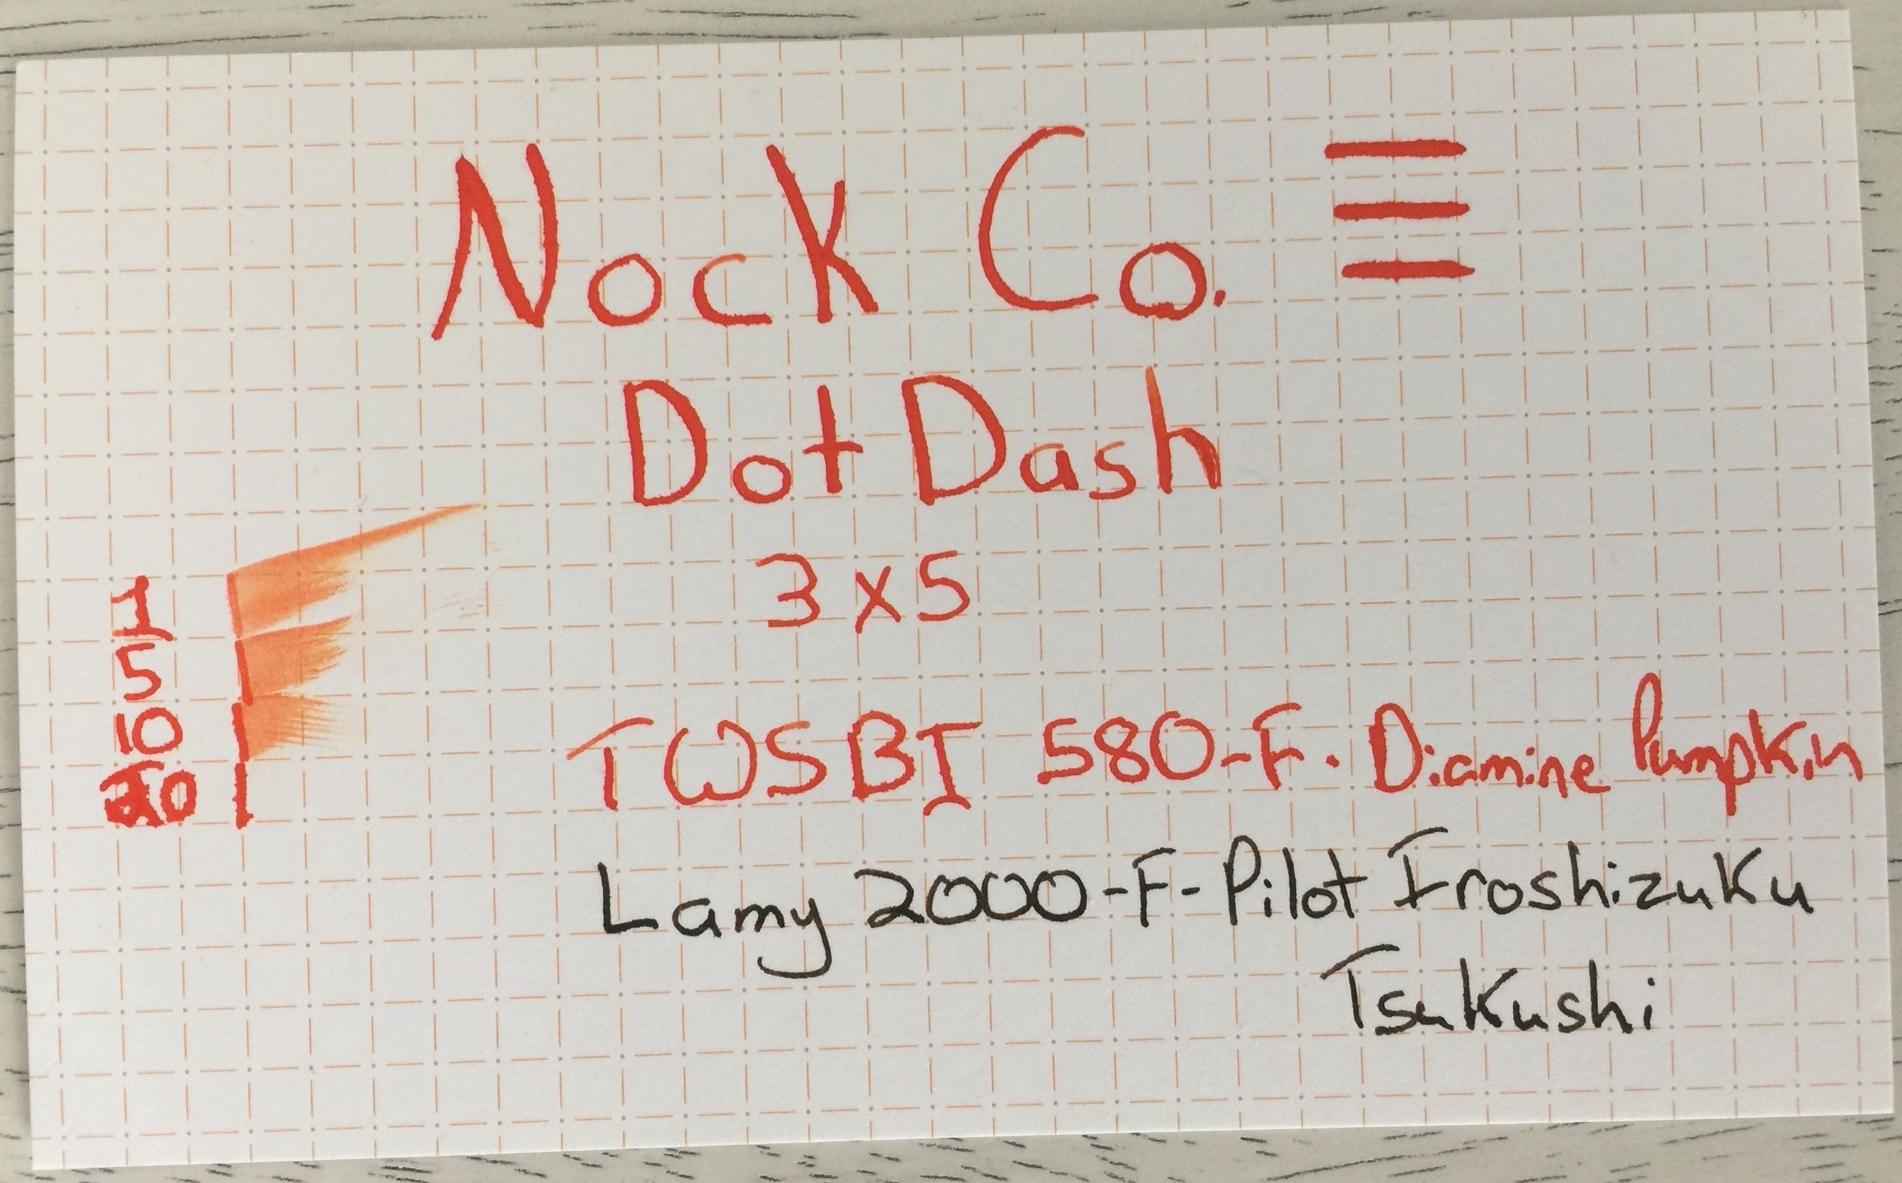 Nock Co. DotDash 3x5 Note Card Handwritten Review.jpg